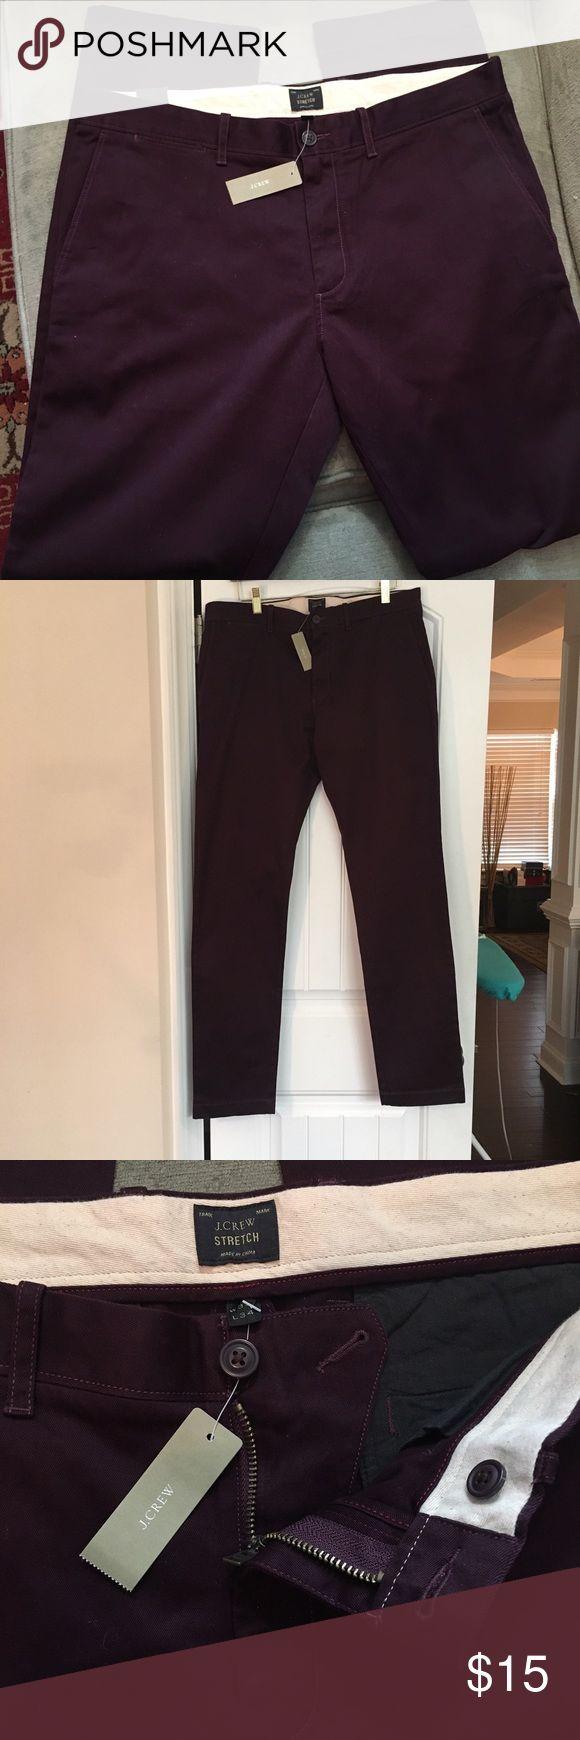 NWT J. Crew women's pants dark purple sz 34 x 34 NWT J. Crew women's pants dark purple sz 34 x 34. Stretch fit, nice stitching. J. Crew Pants Trousers